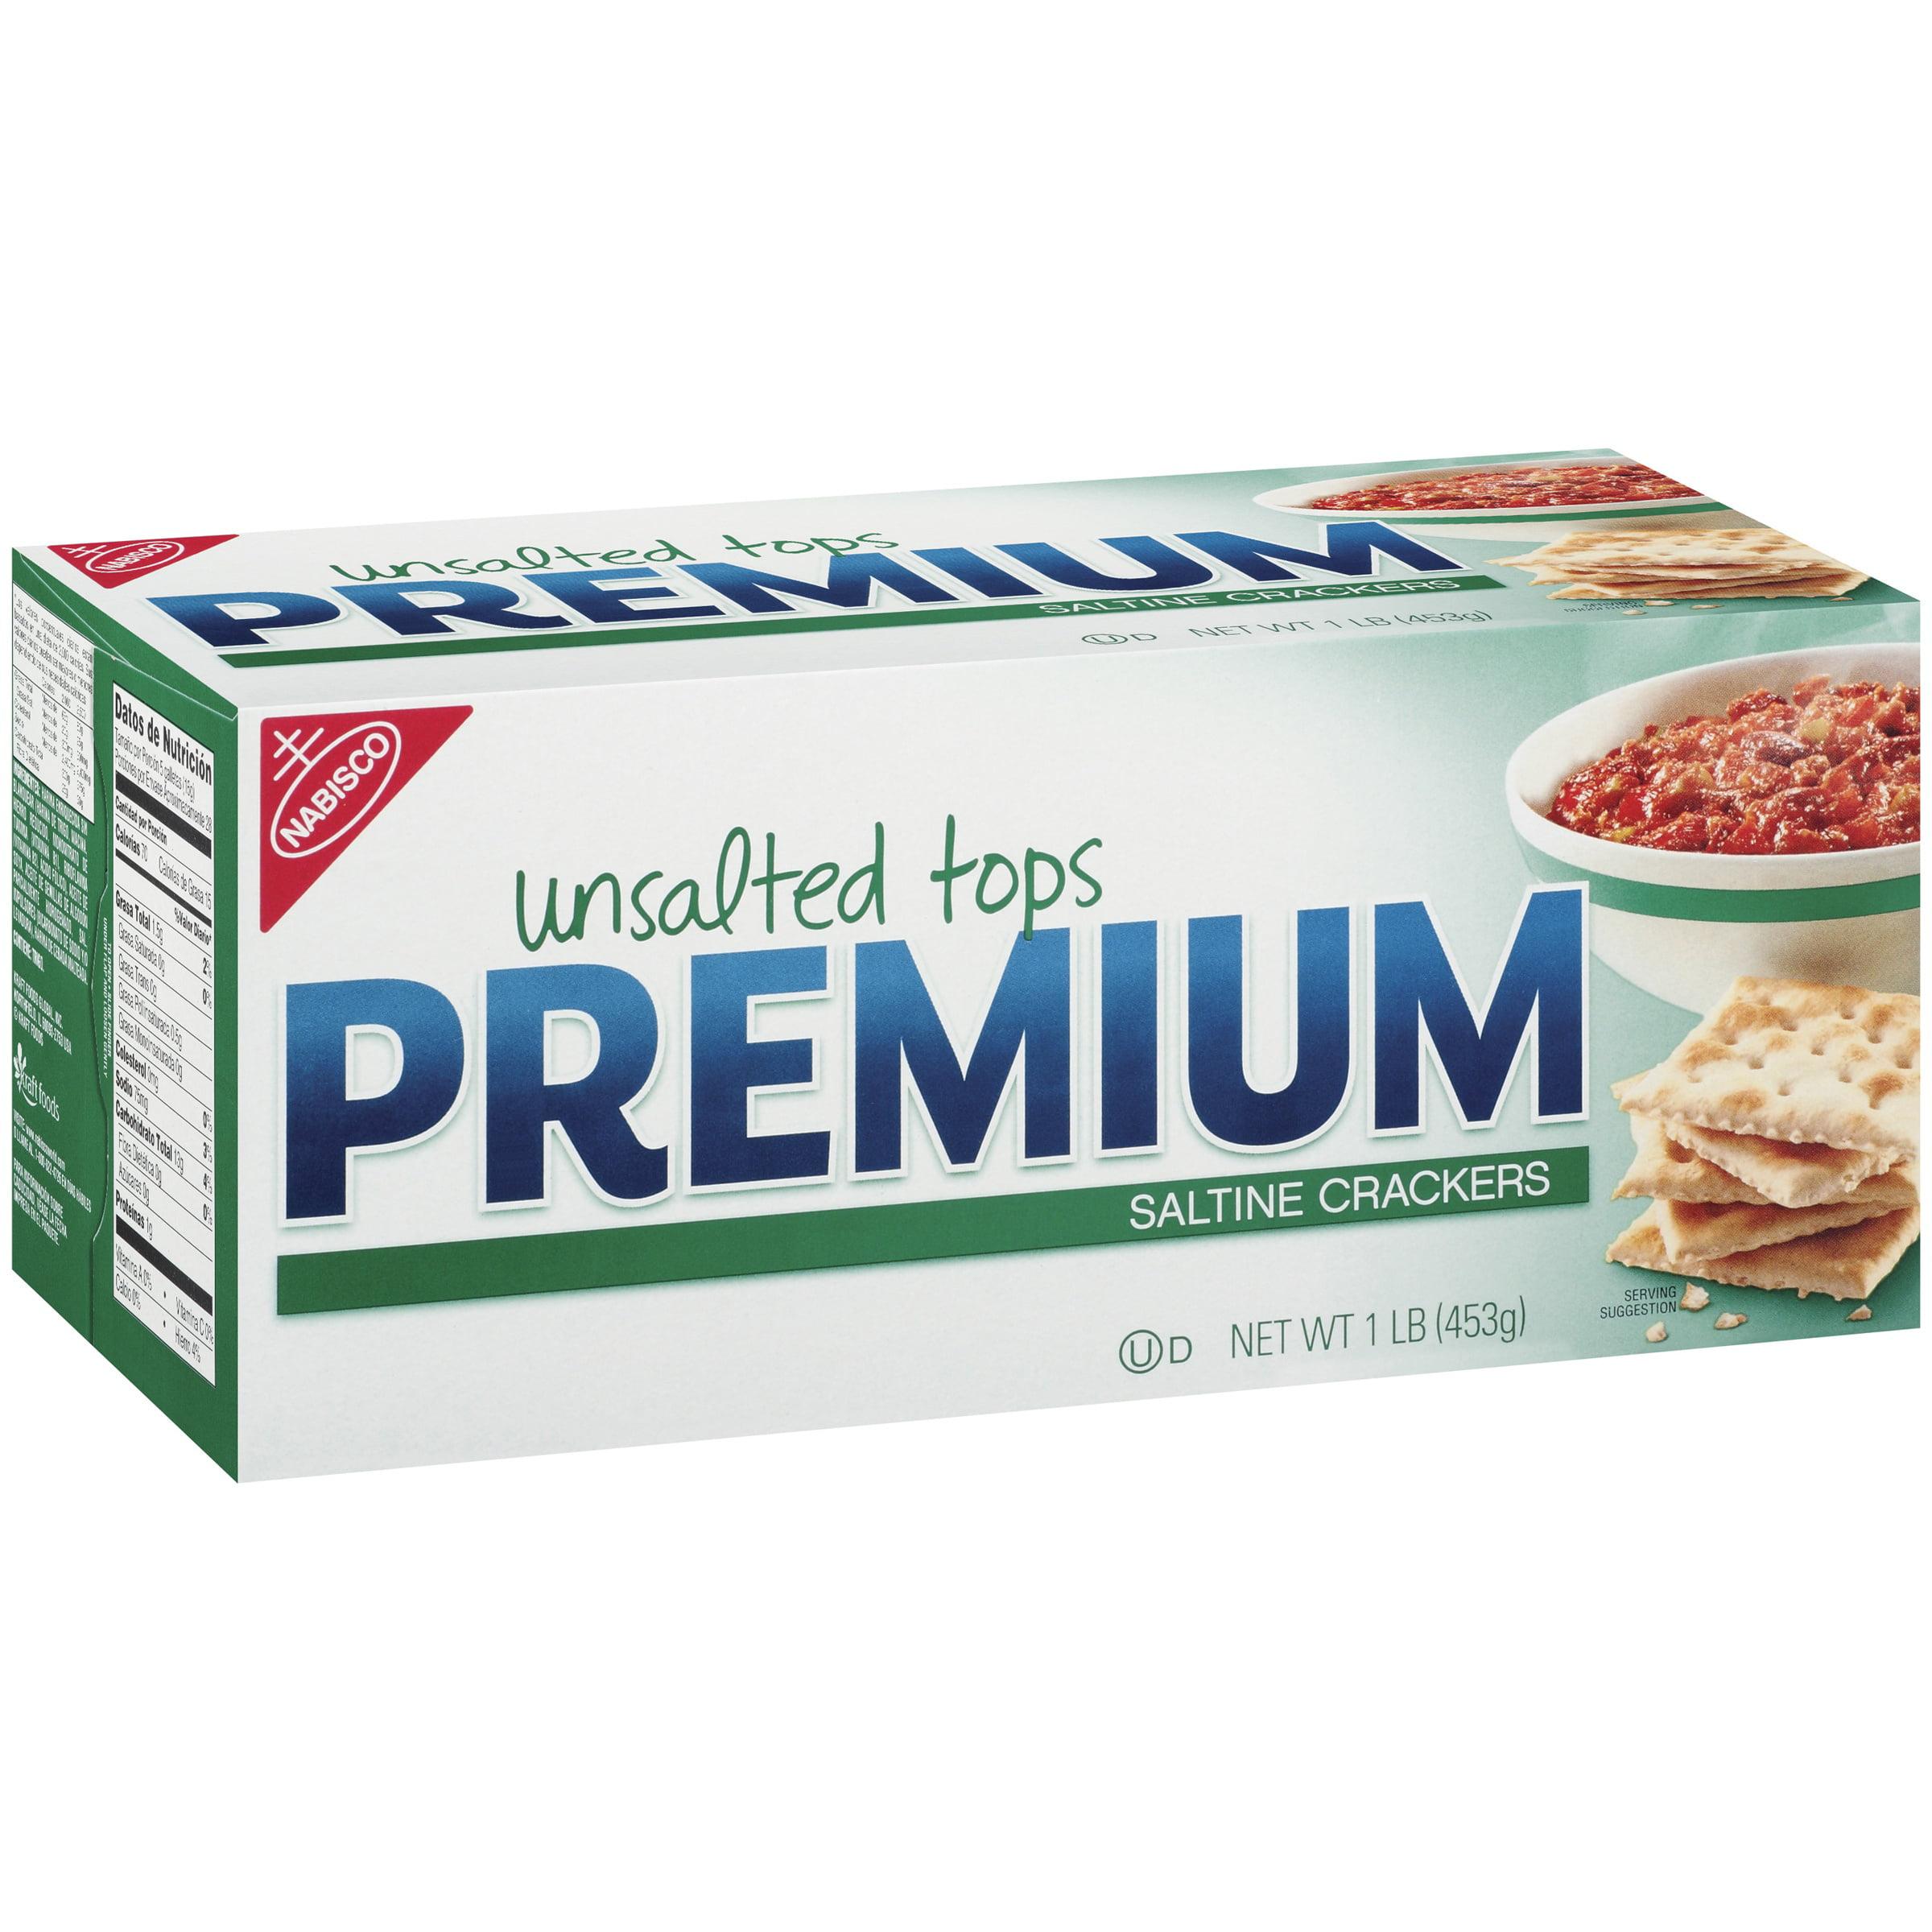 Nabisco Premium Unsalted Tops Saltine Crackers 16 Oz Box